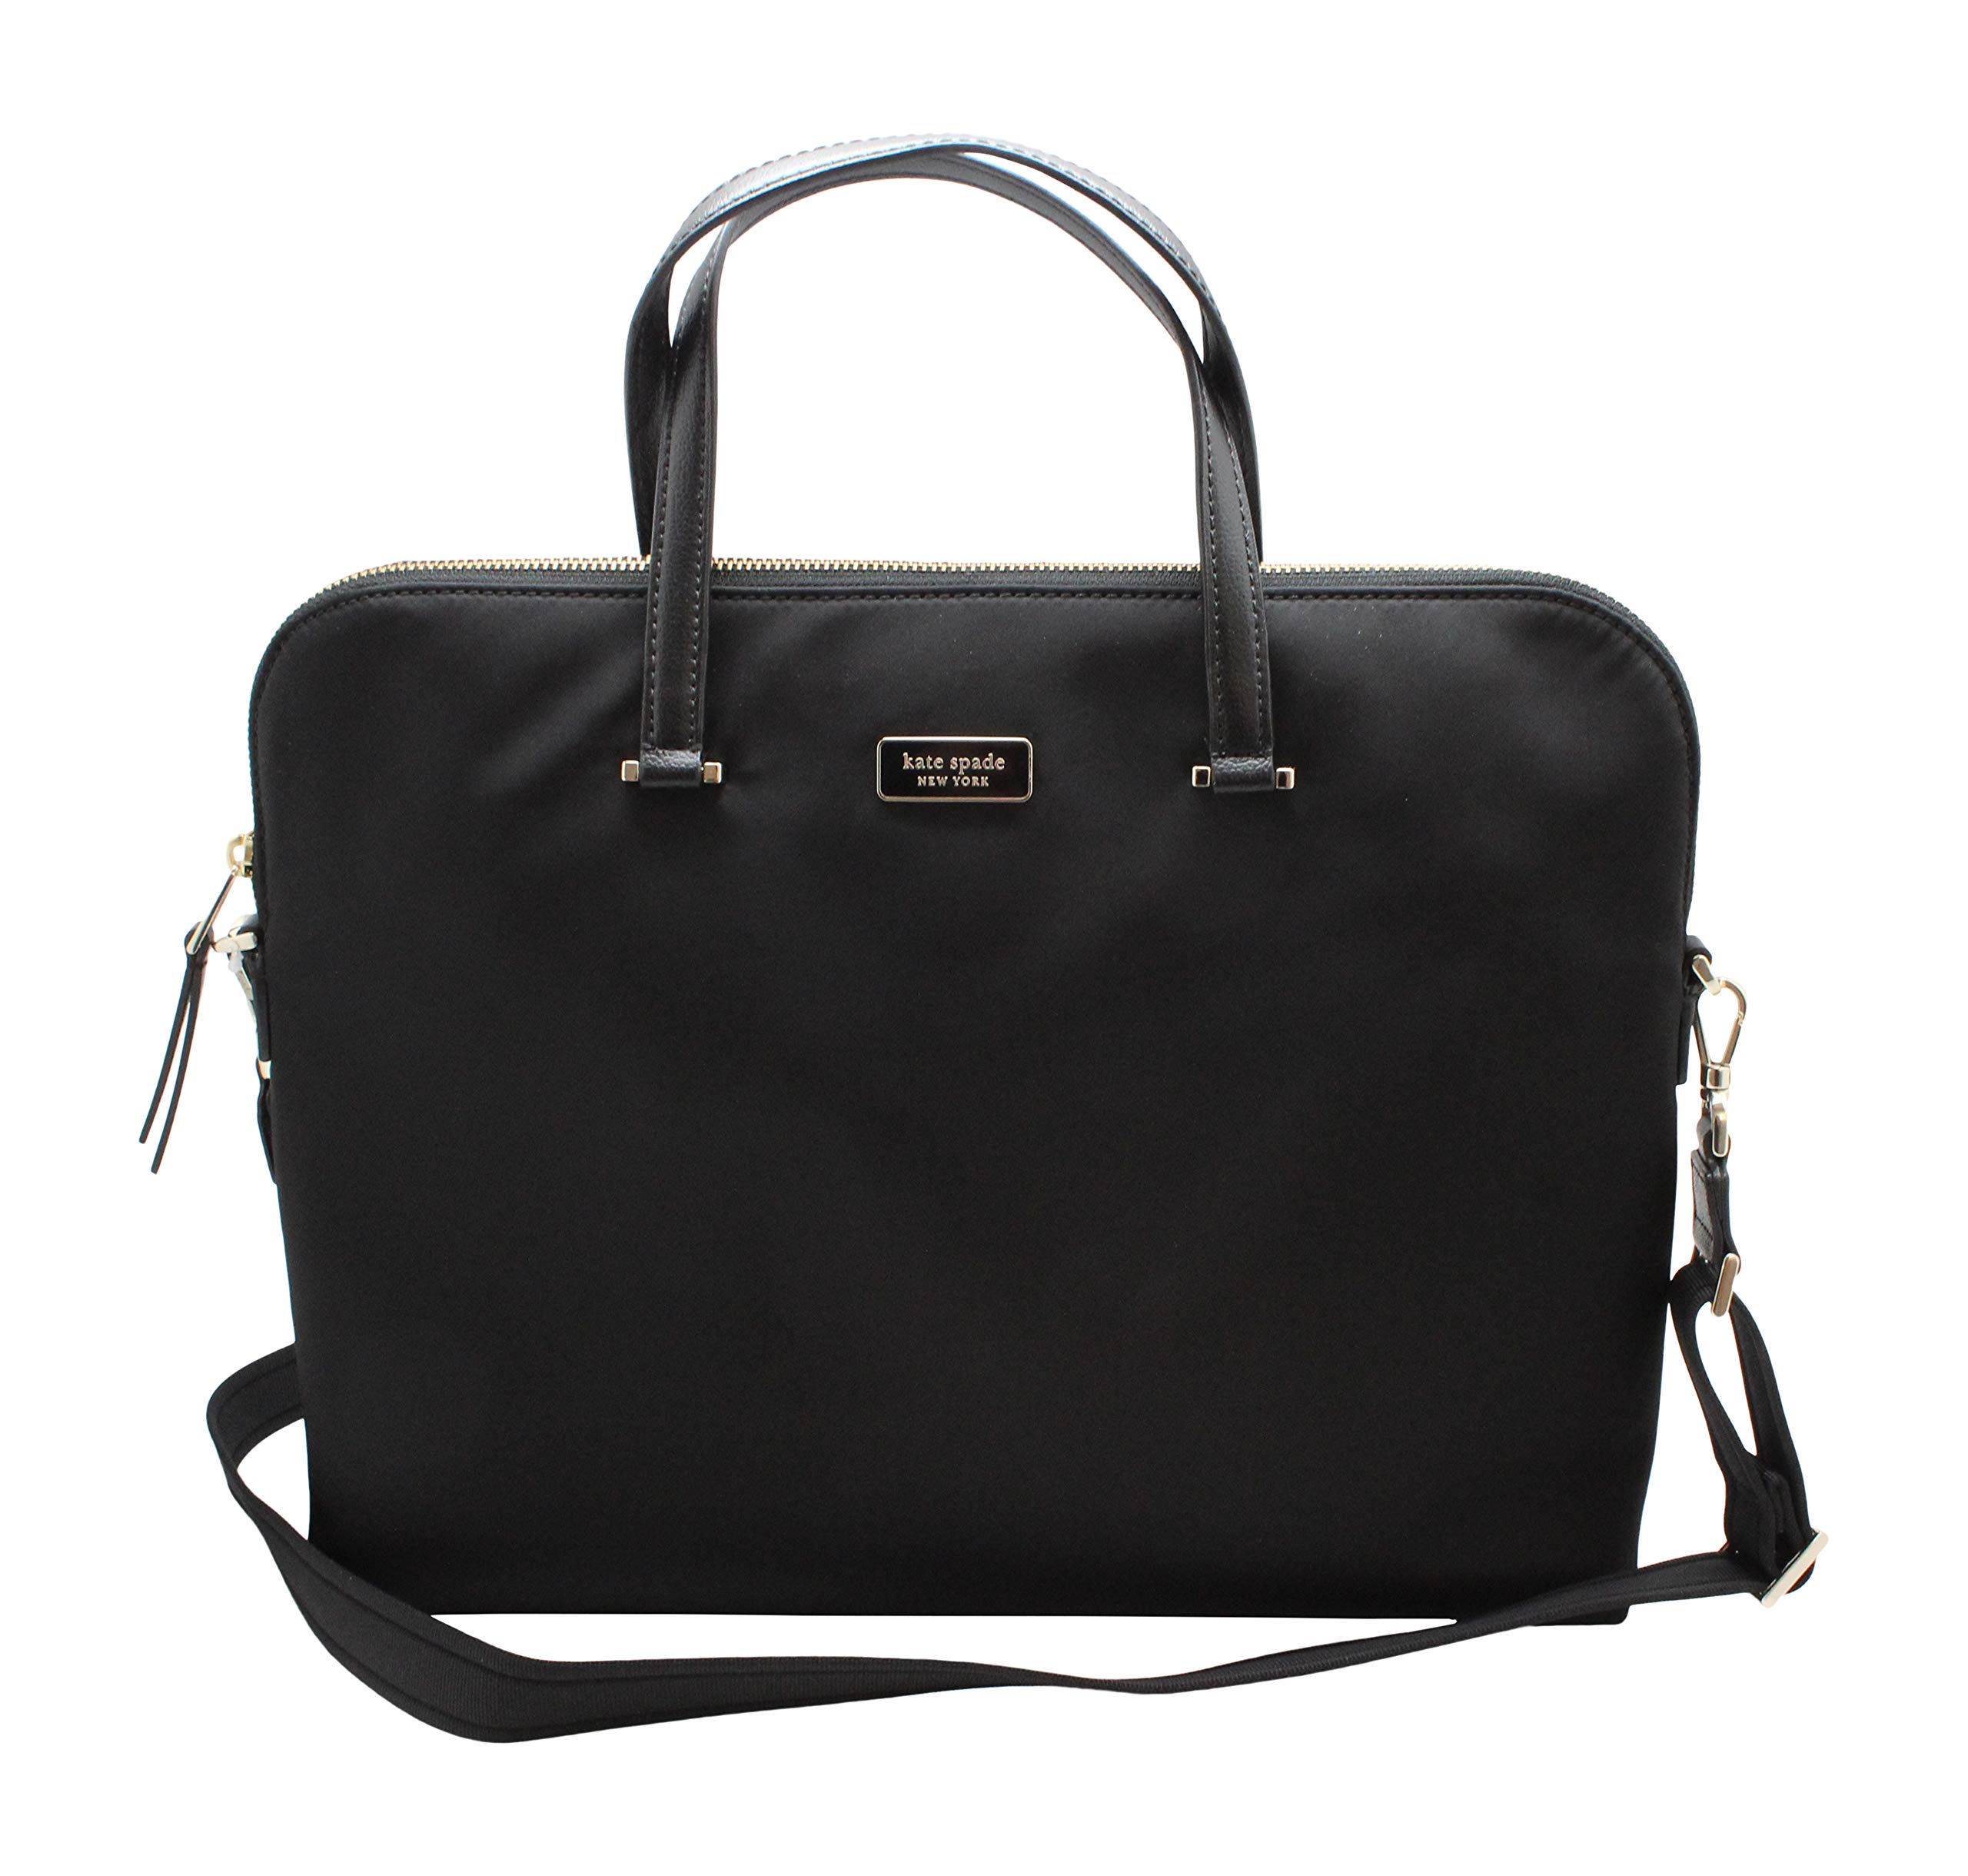 Kate Spade New York Tote Dawn Laptop Bag (Black) by Kate Spade New York